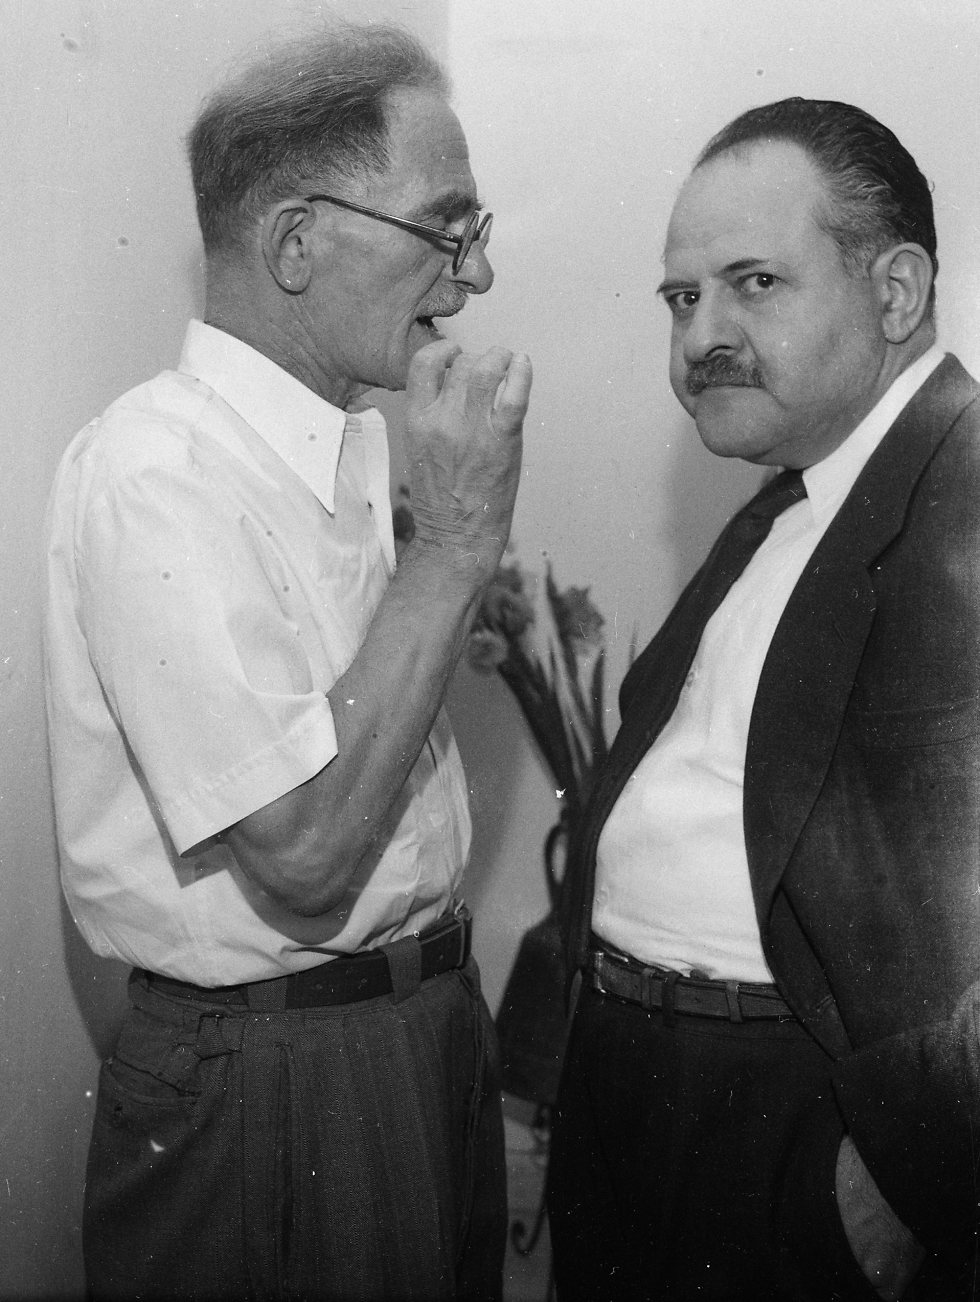 MK Moshe Sneh speaking to MK Moshe Erem at the Knesset, 1955 (Photo: David Rubinger)